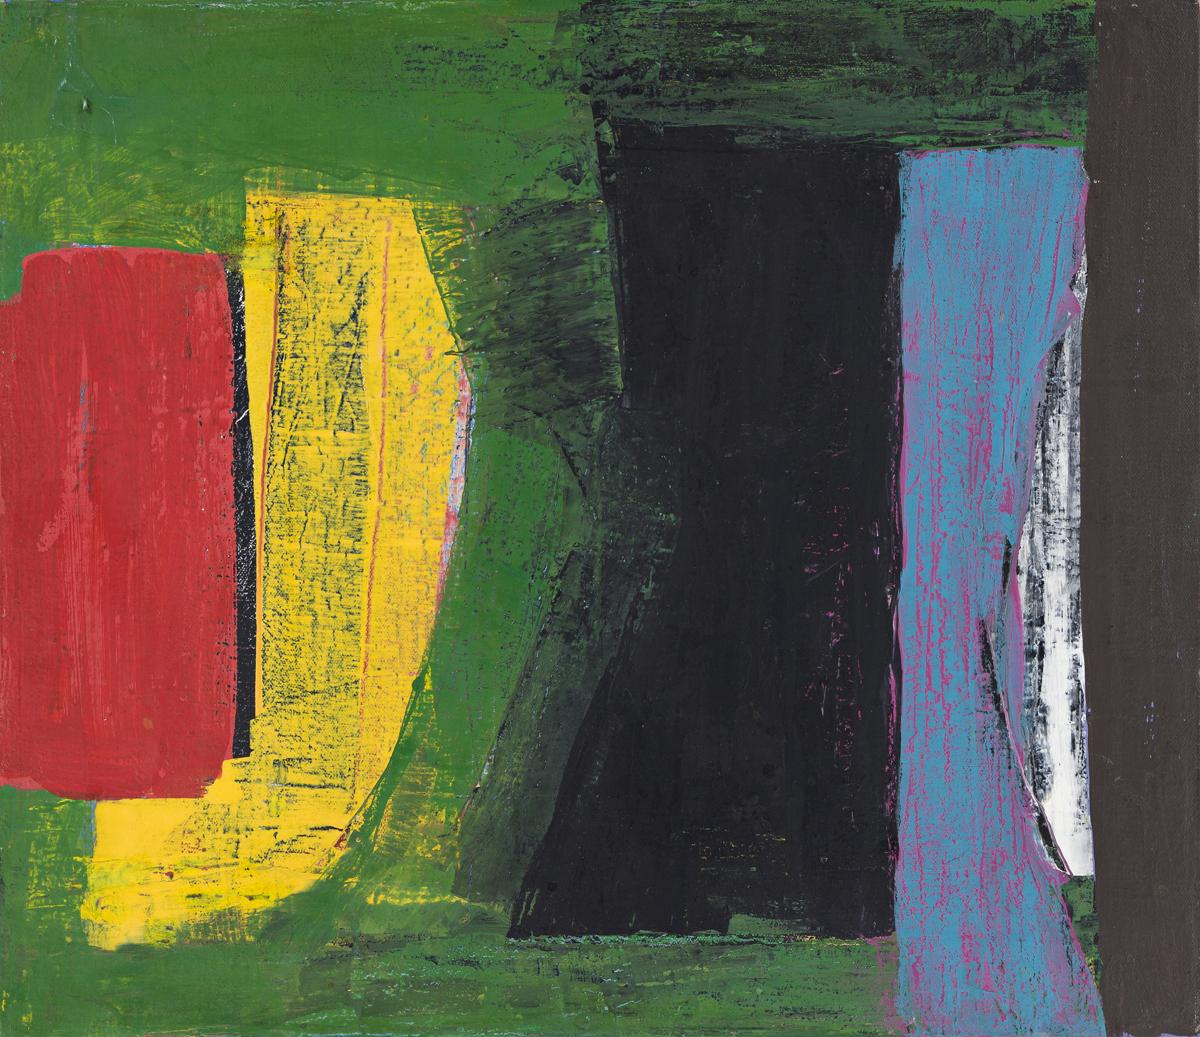 ERNEST BRIGGS (1923 - 1984, AMERICAN) Untitled.